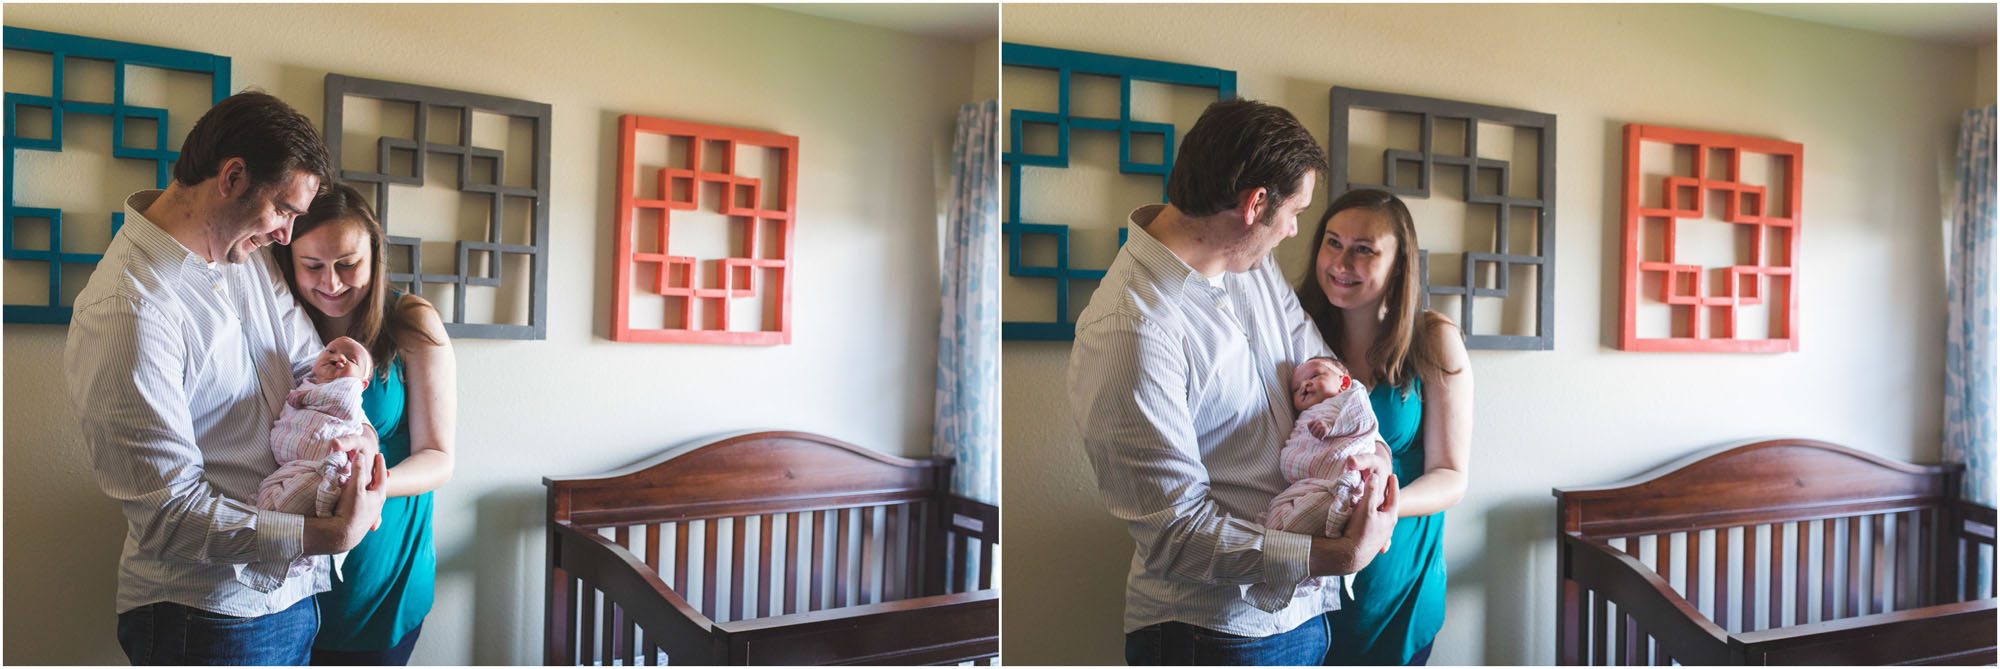 ashley vos photography seattle newborn photographer_0021.jpg